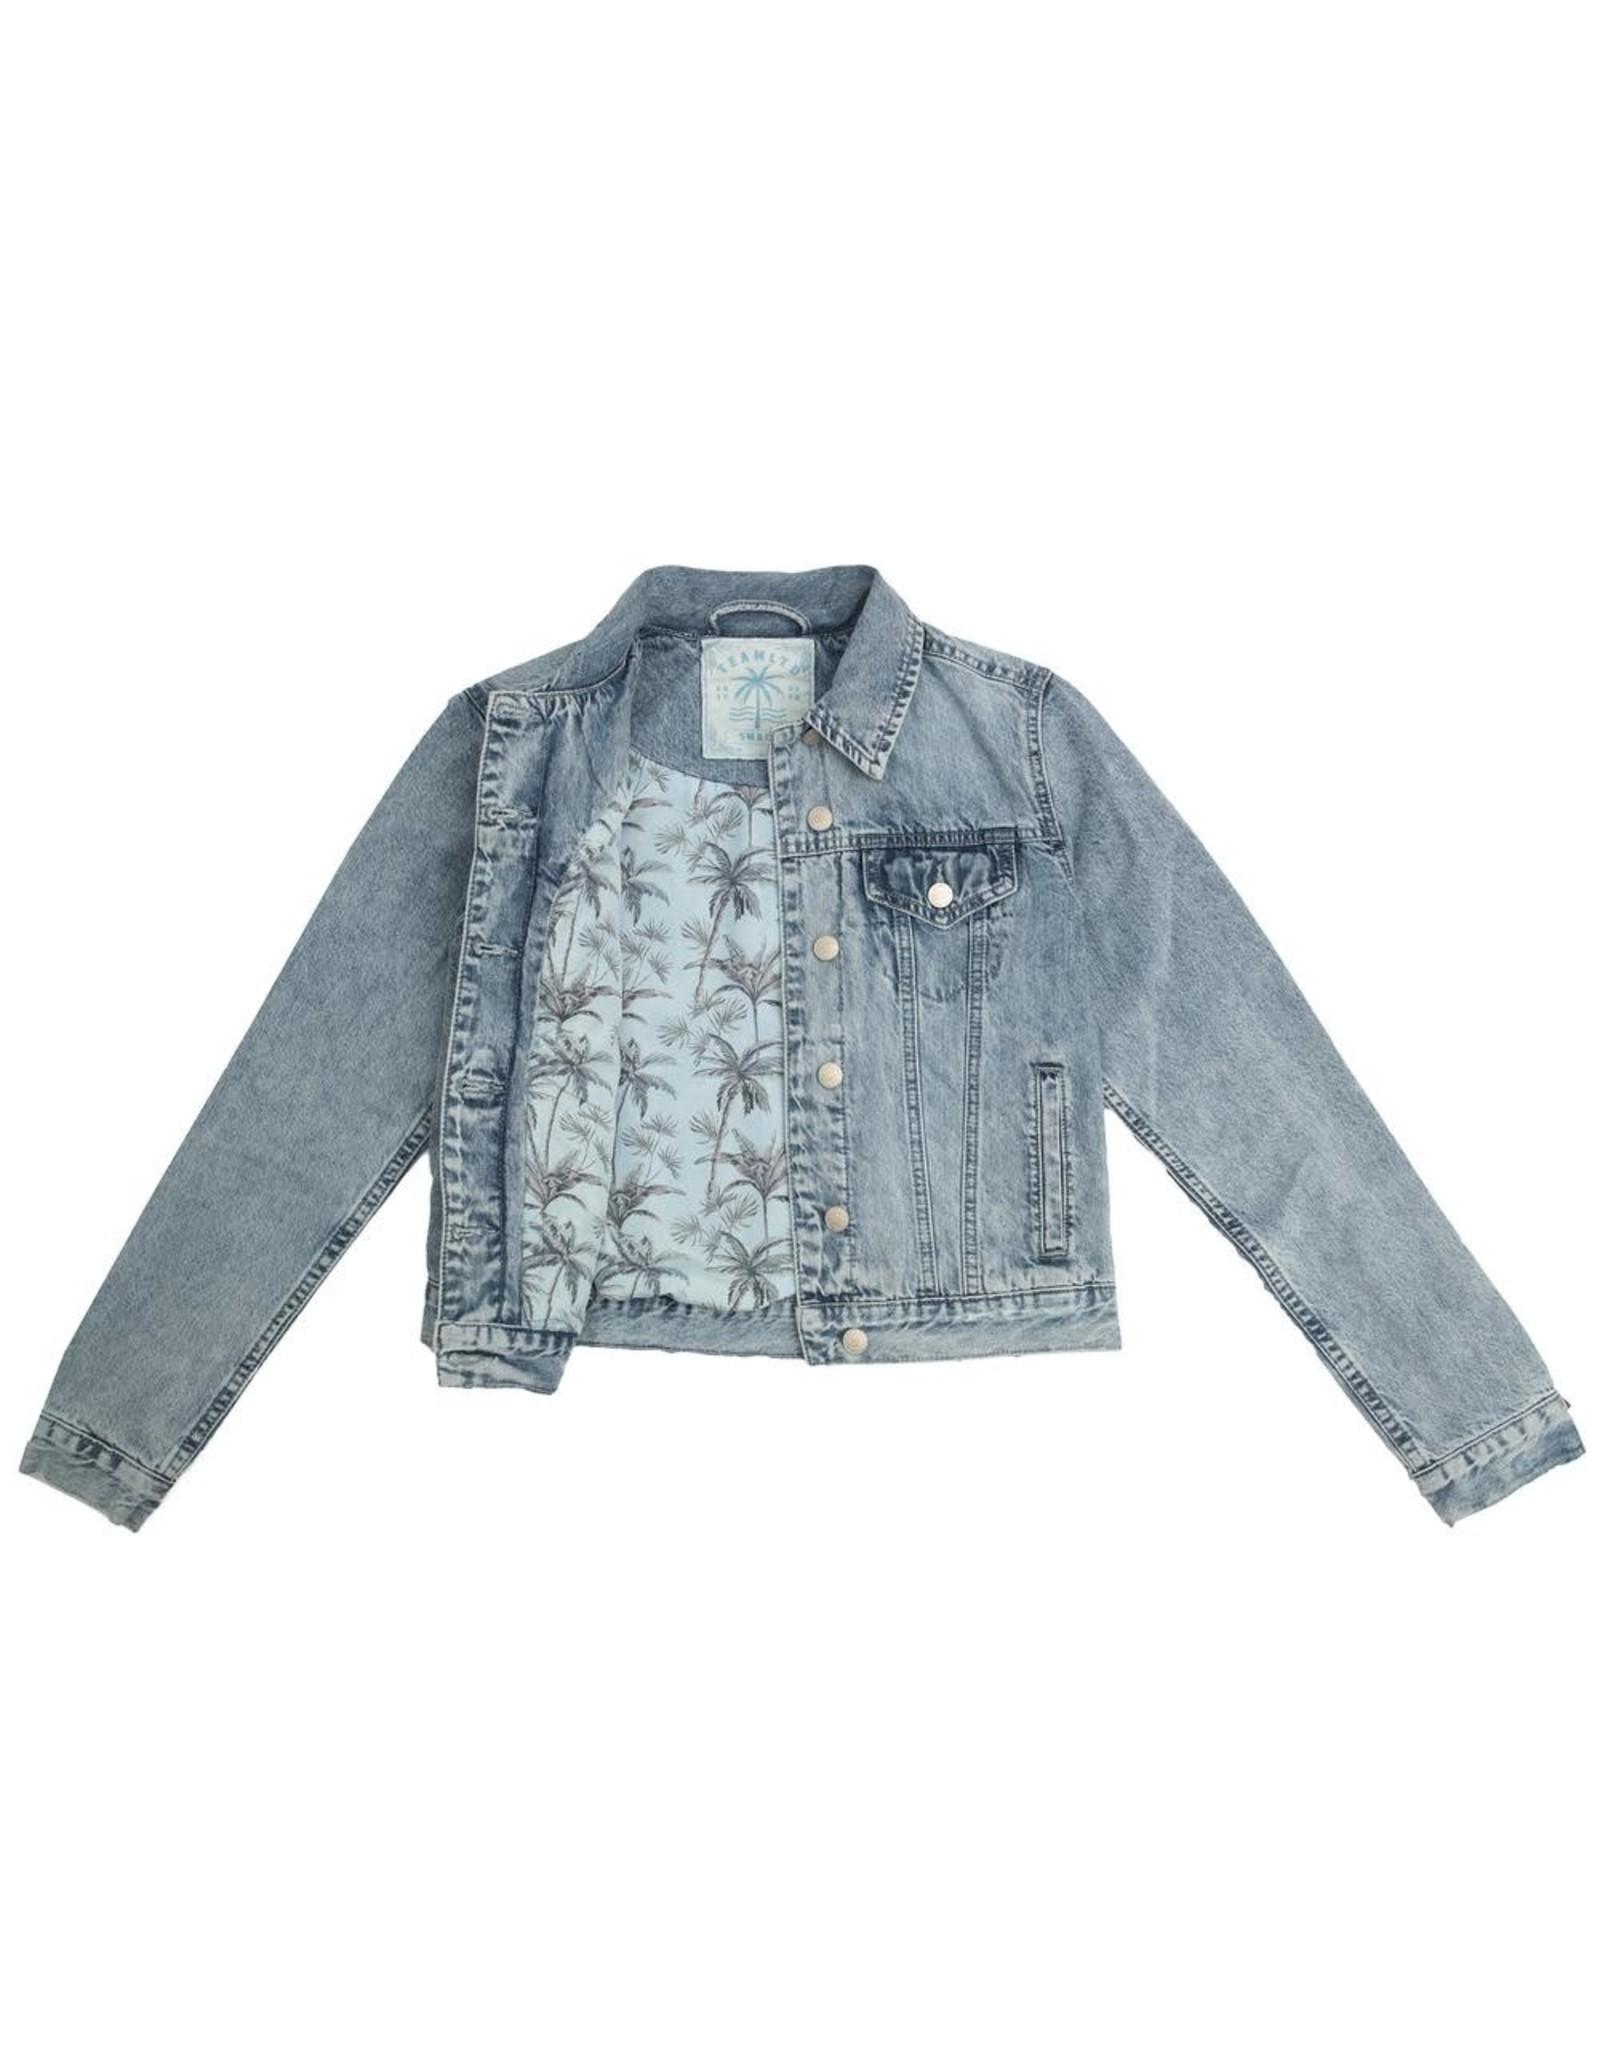 TEAMLTD Denim Jacket